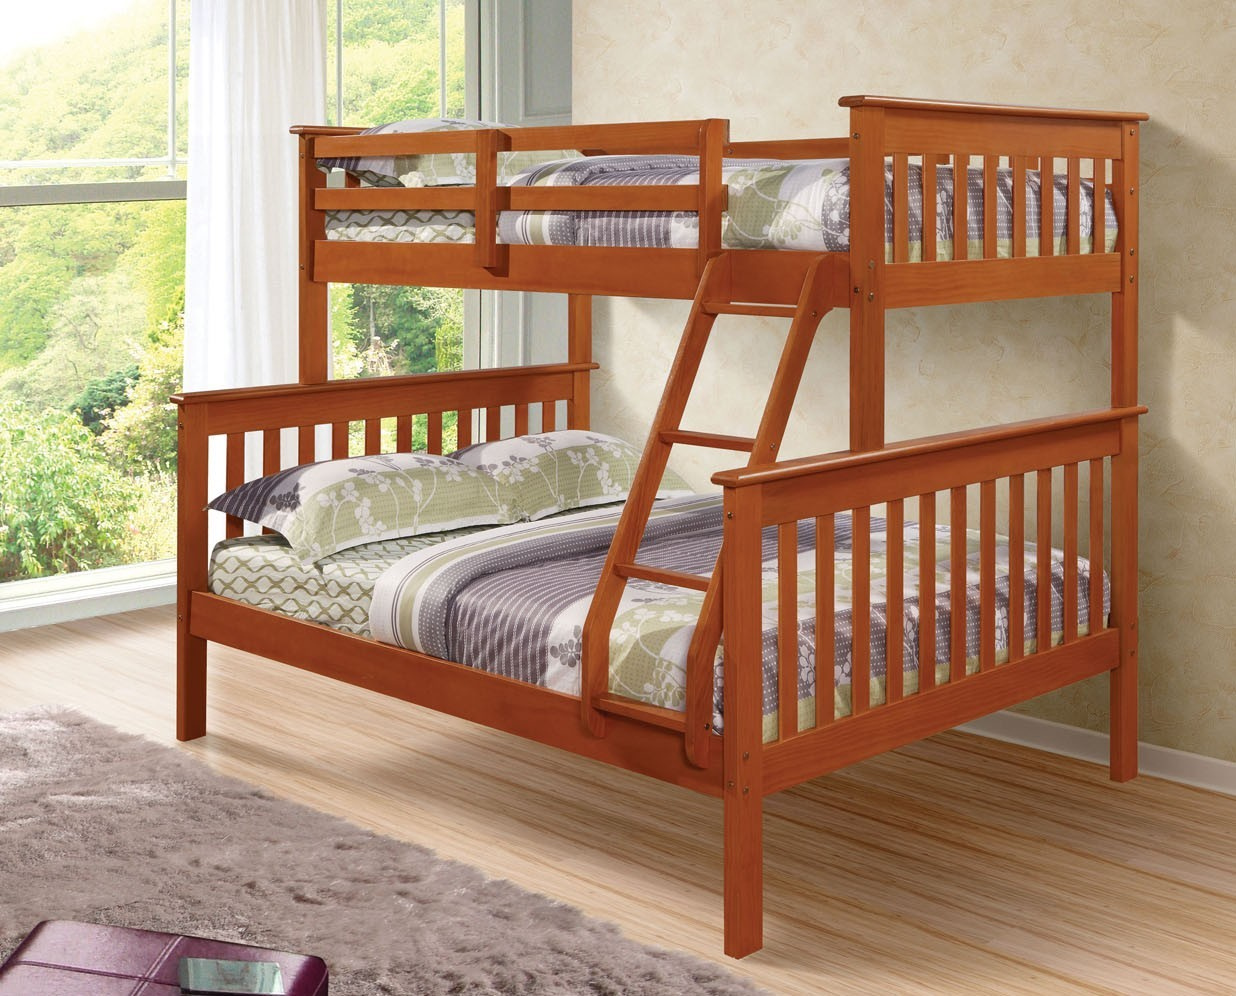 122-3E_TF_Mission Bunk Bed